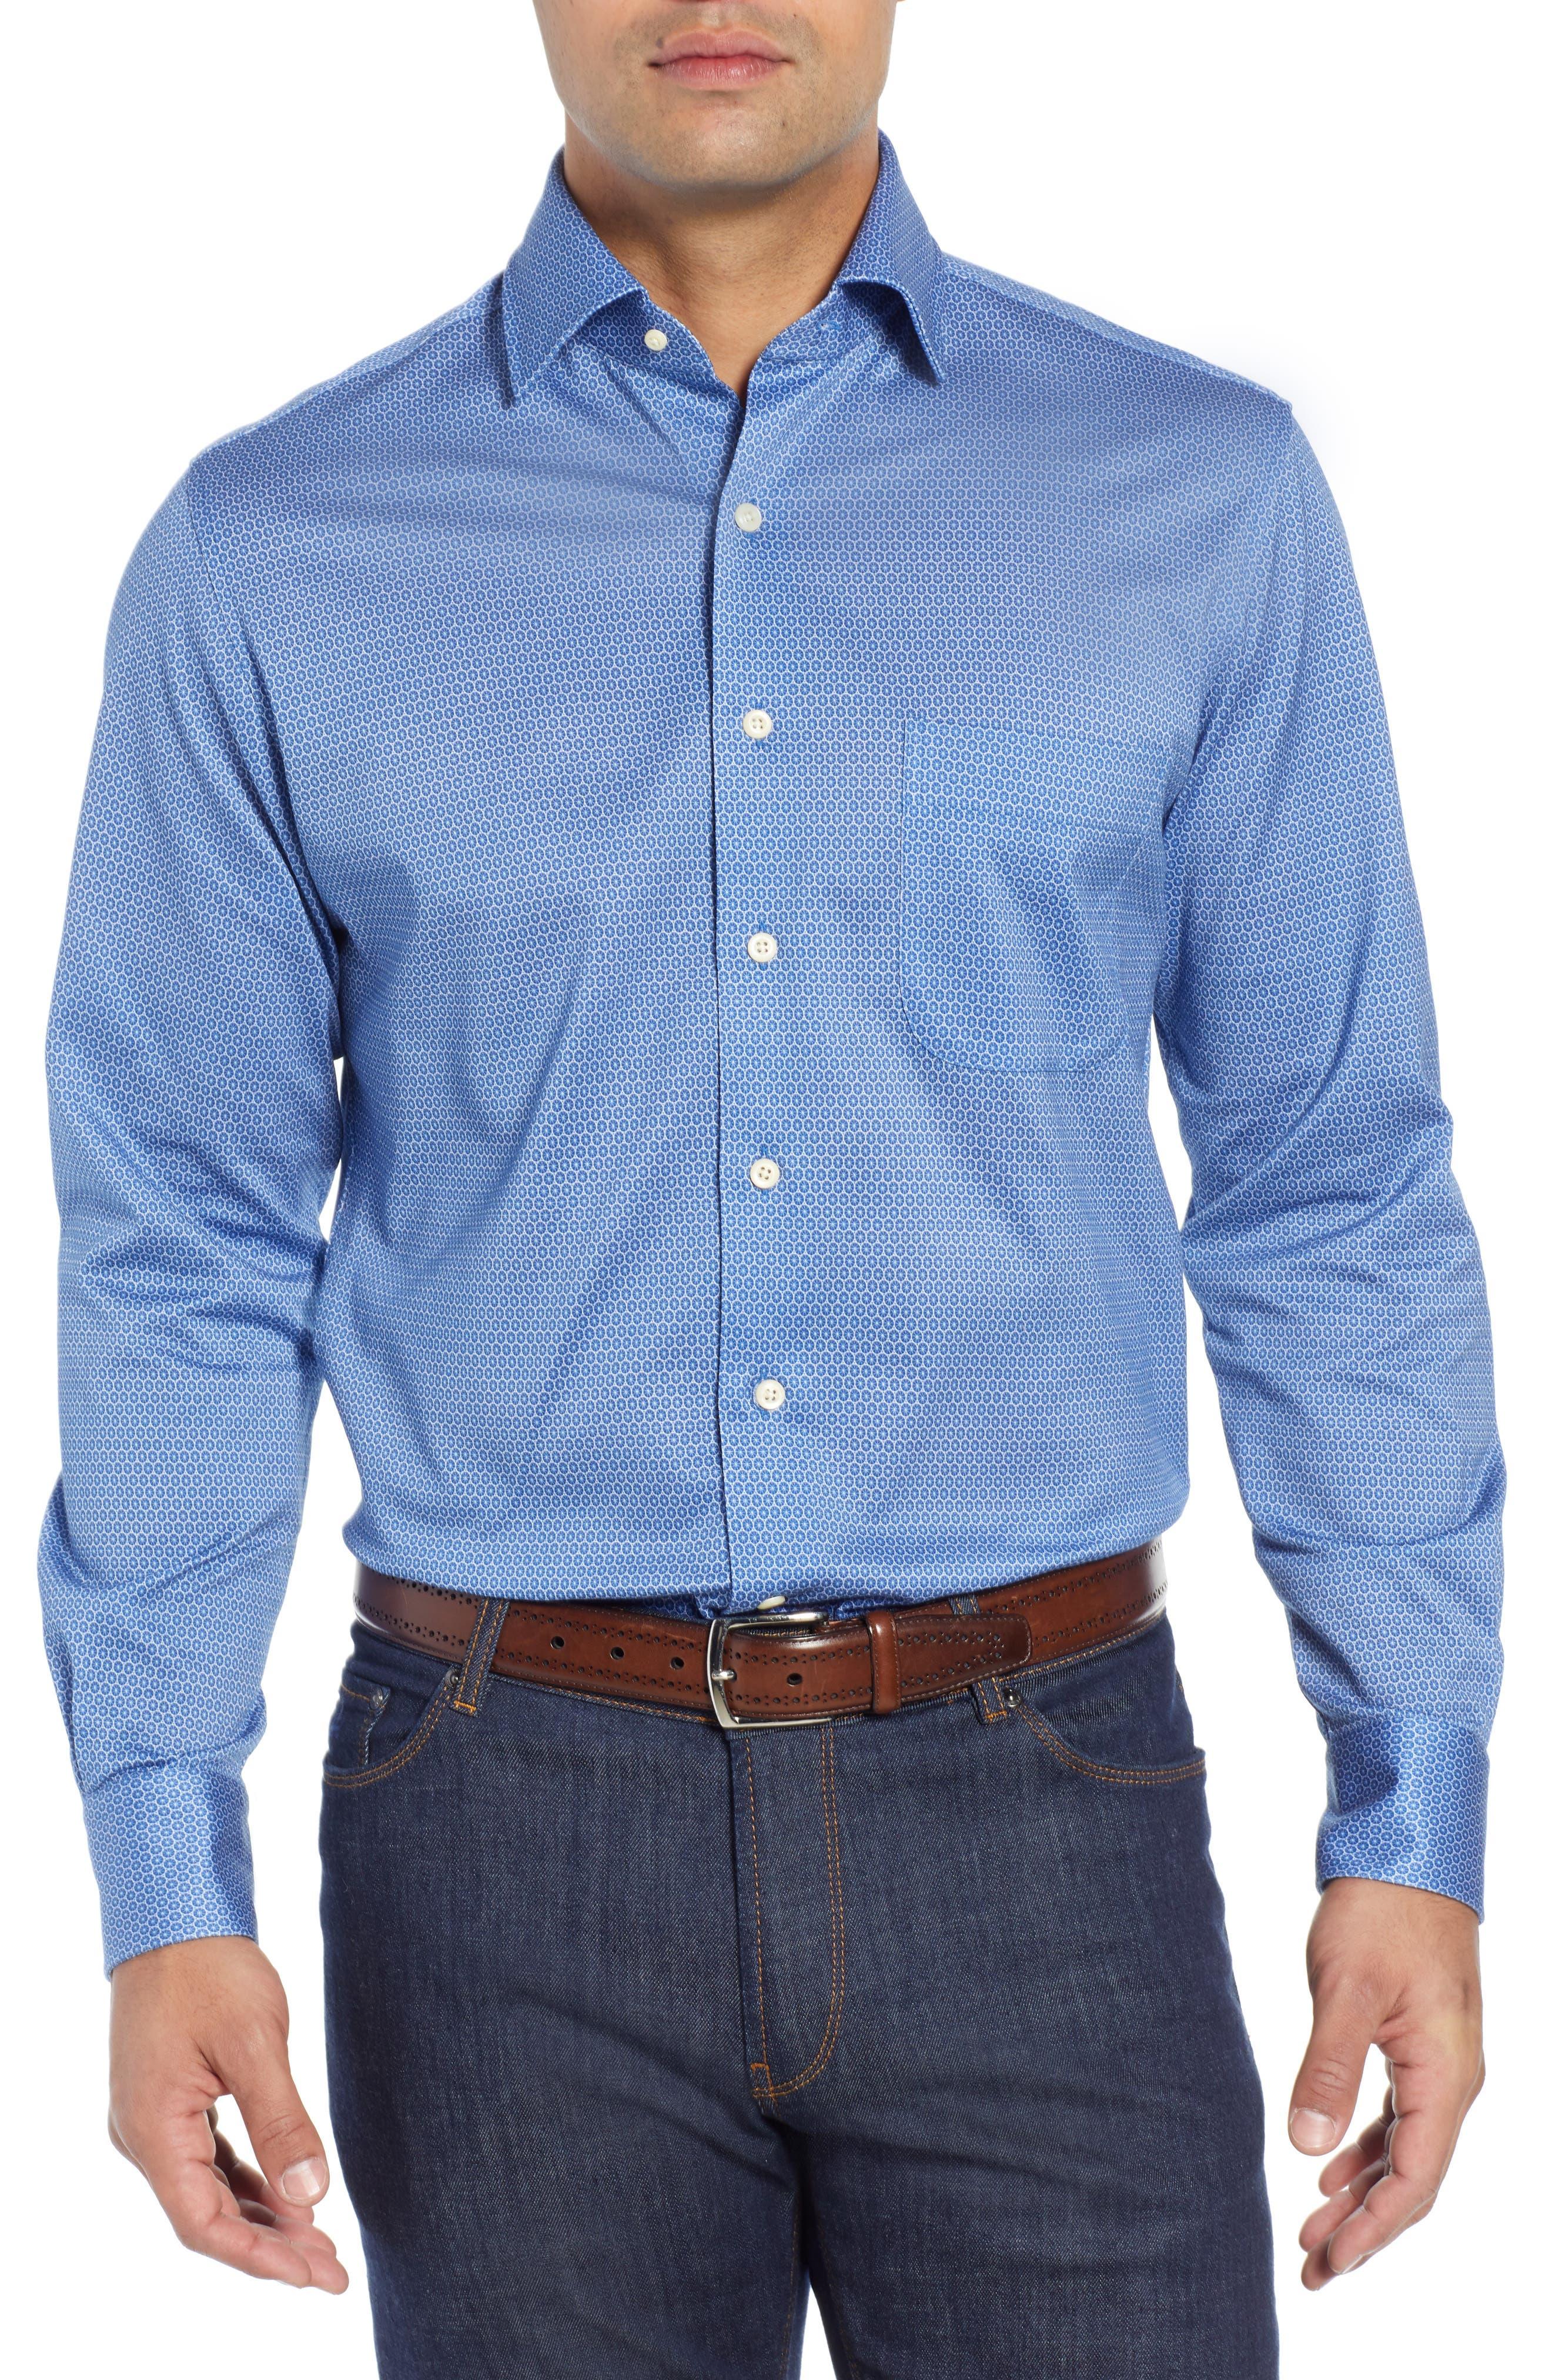 Schwinn Sport Shirt,                             Main thumbnail 1, color,                             PLAZA BLUE